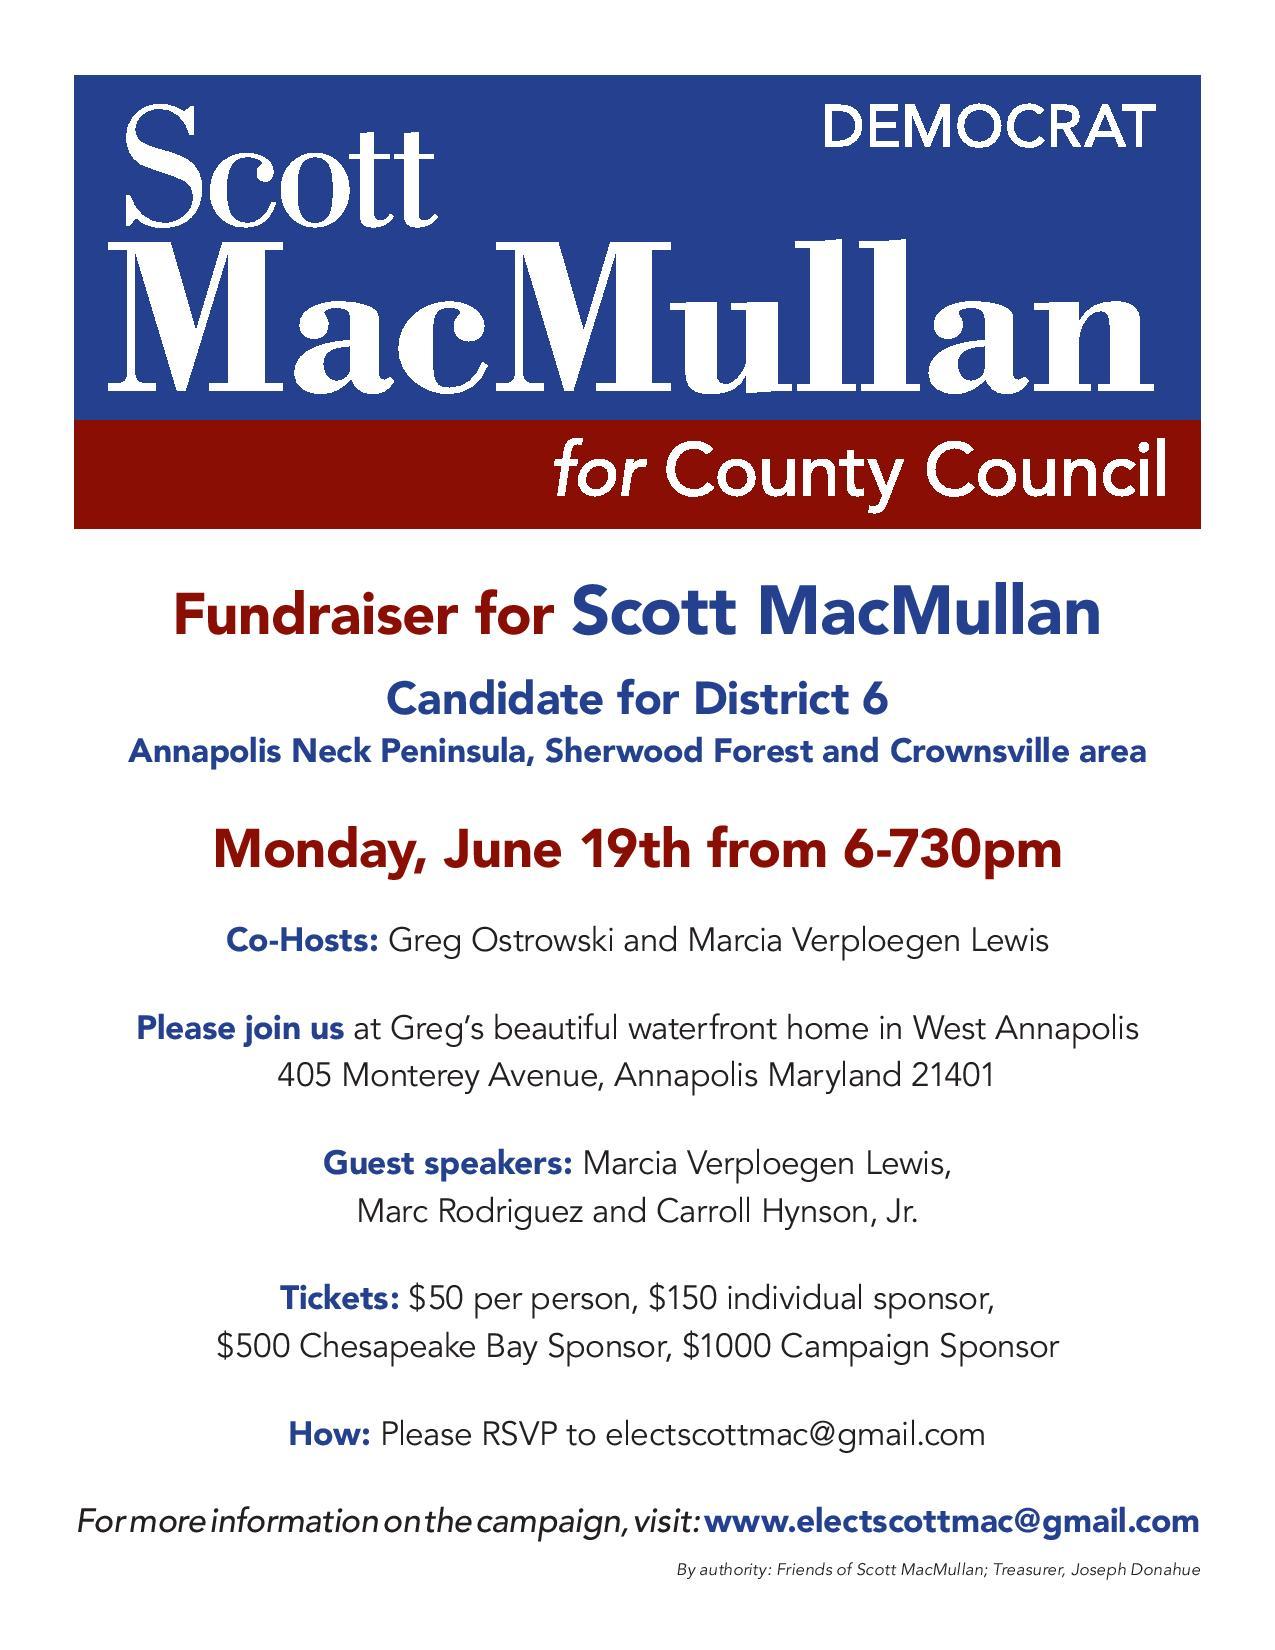 MacMullan_Fundraiser_Flyer_2-page-001.jpg